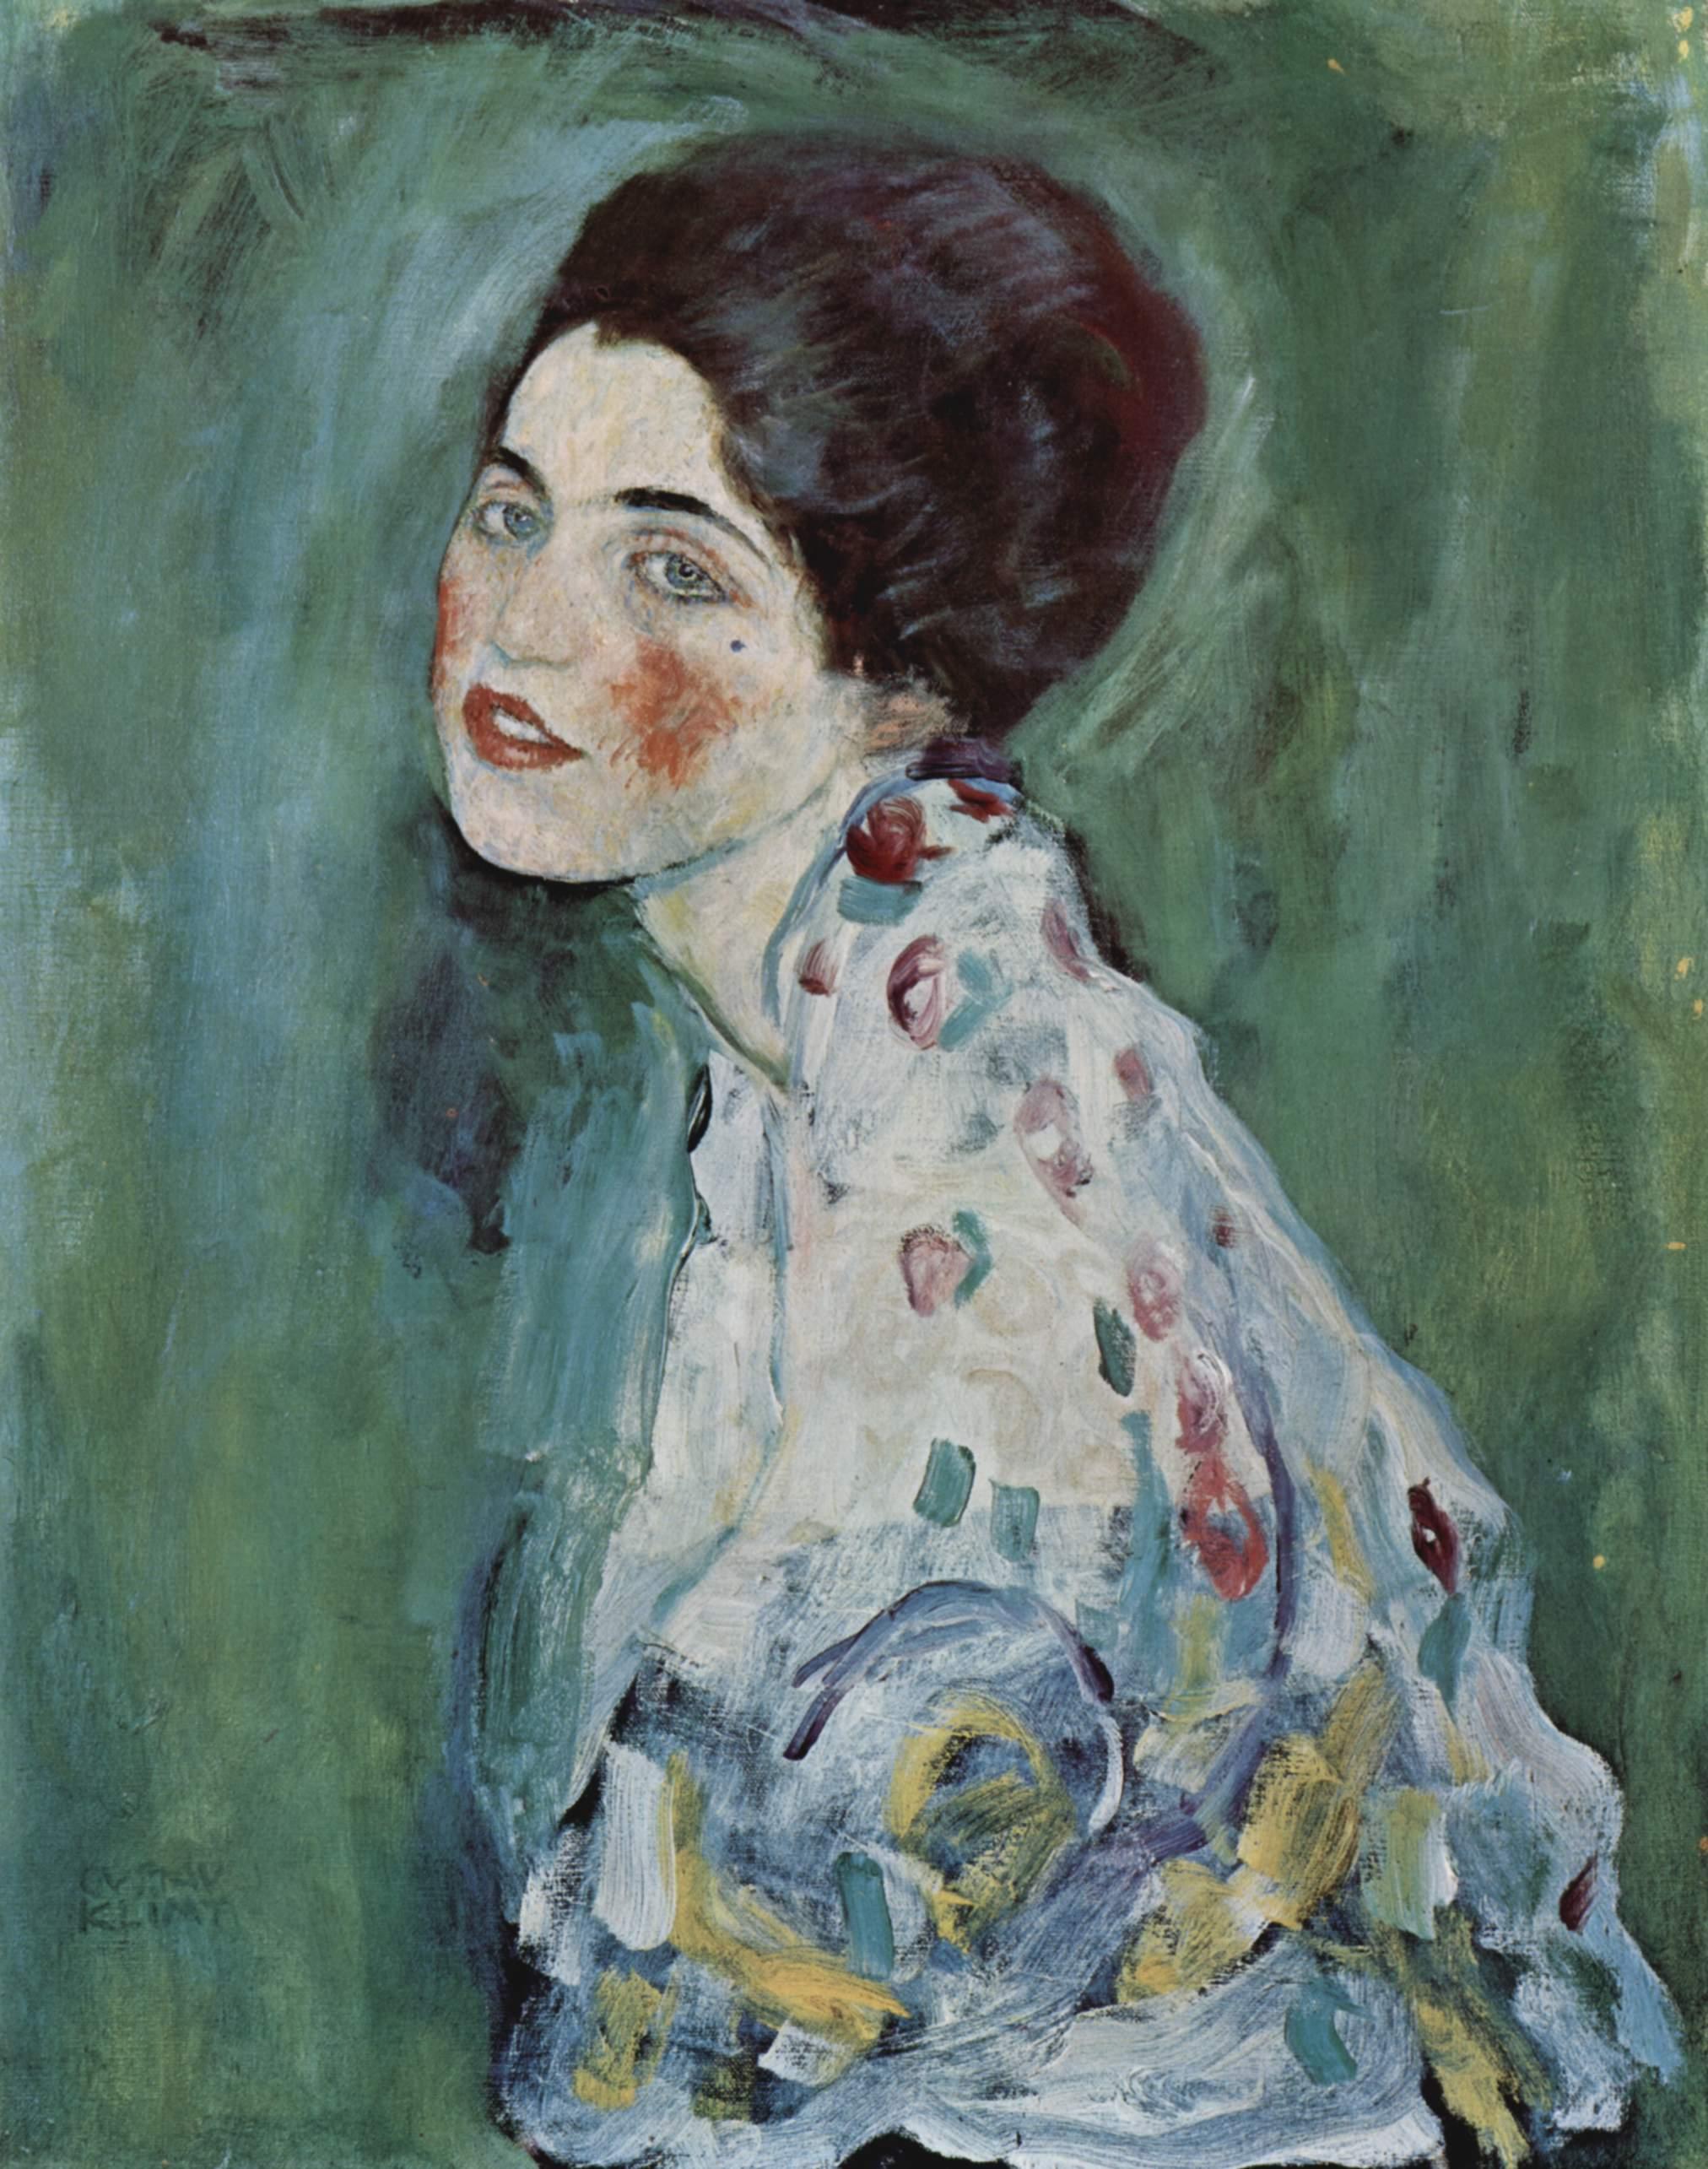 Porträt enier Dame  by Gustav Klimt via  Wikimedia Commons